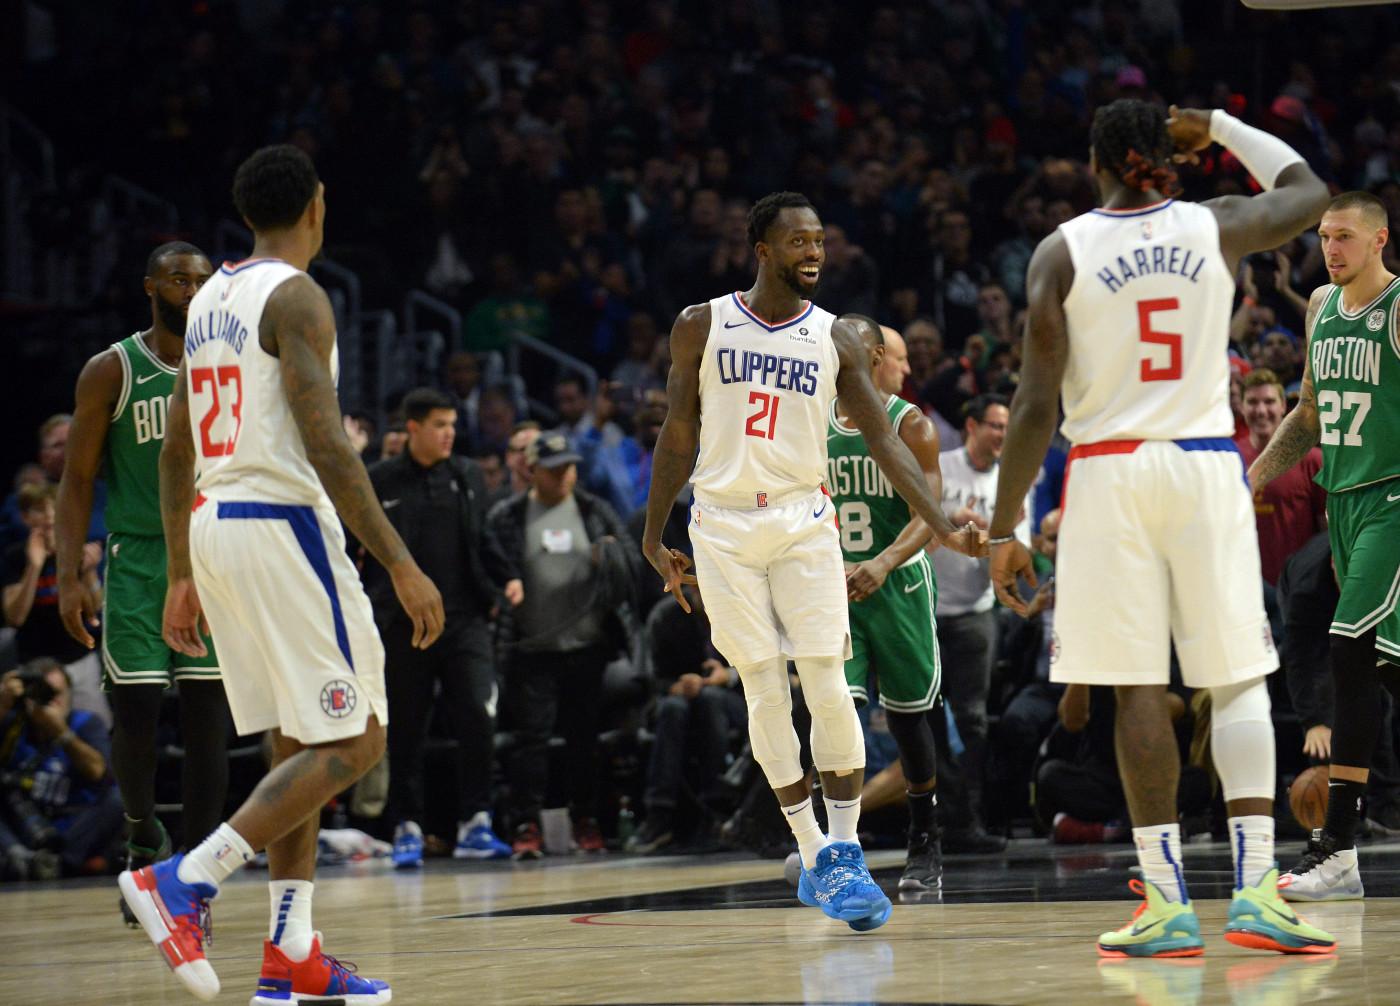 Patrick Beverley Clippers Celtics Nov 2019